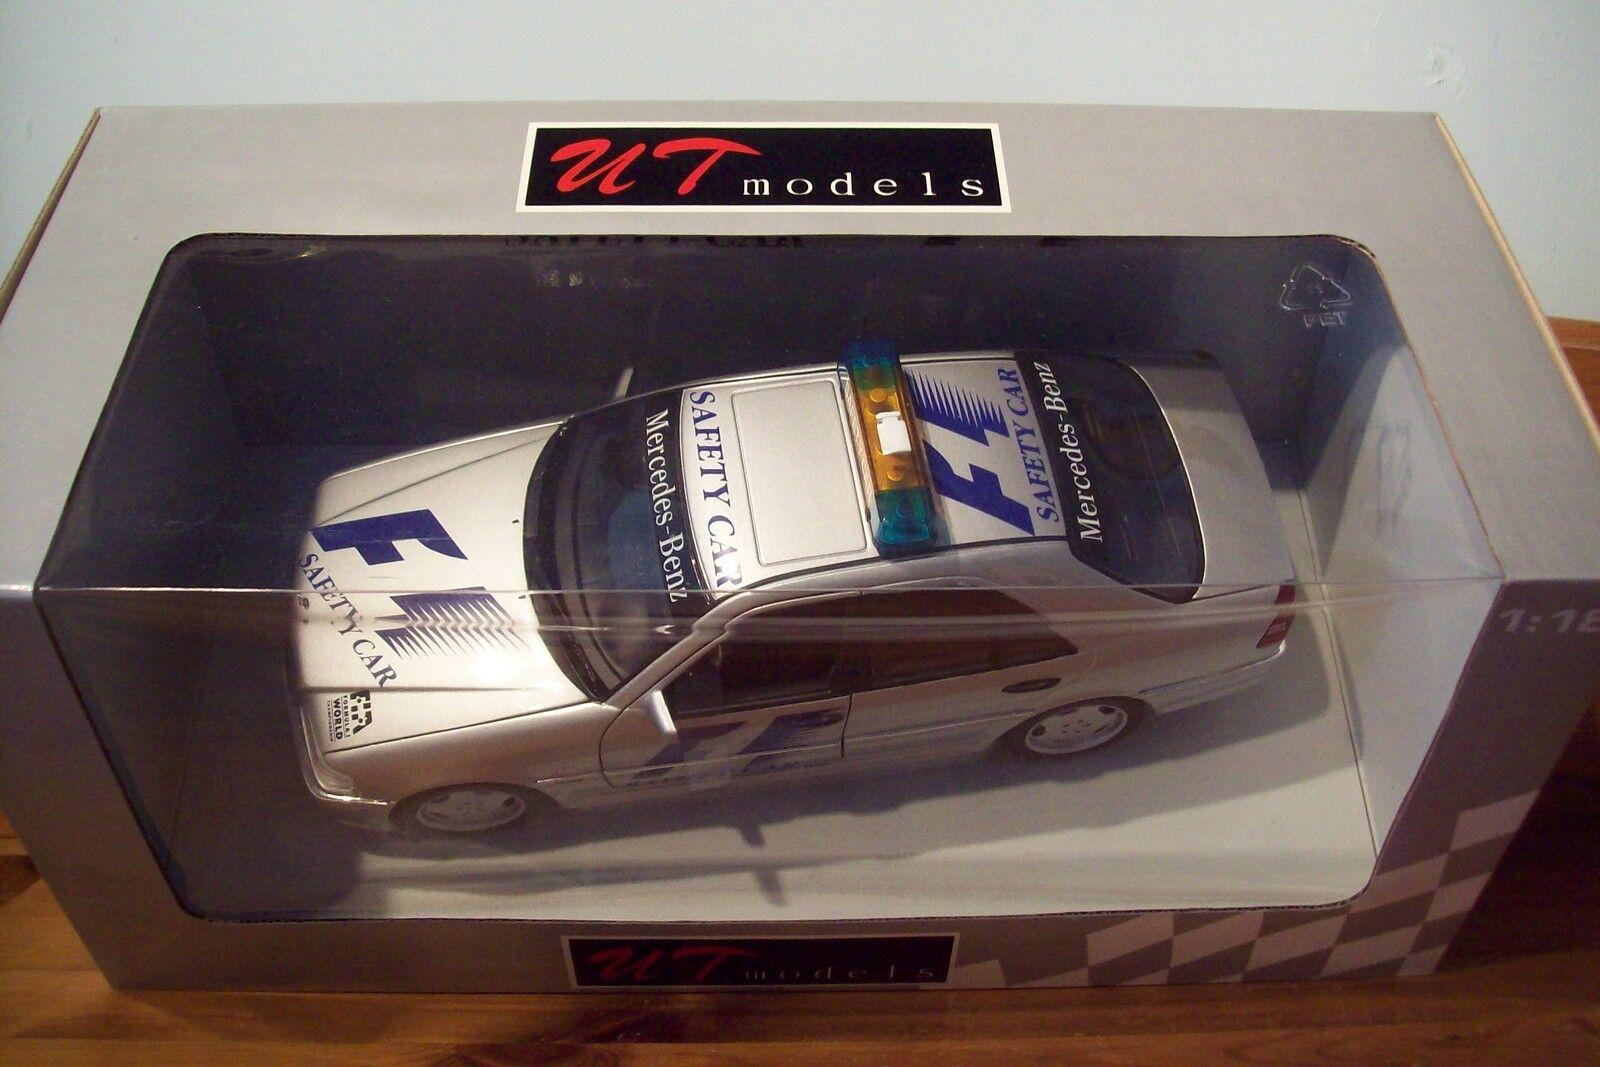 1 18 UT MODELS 26105 MERCEDES BENZ C CLASS AMG SAFETY CAR F1 1997